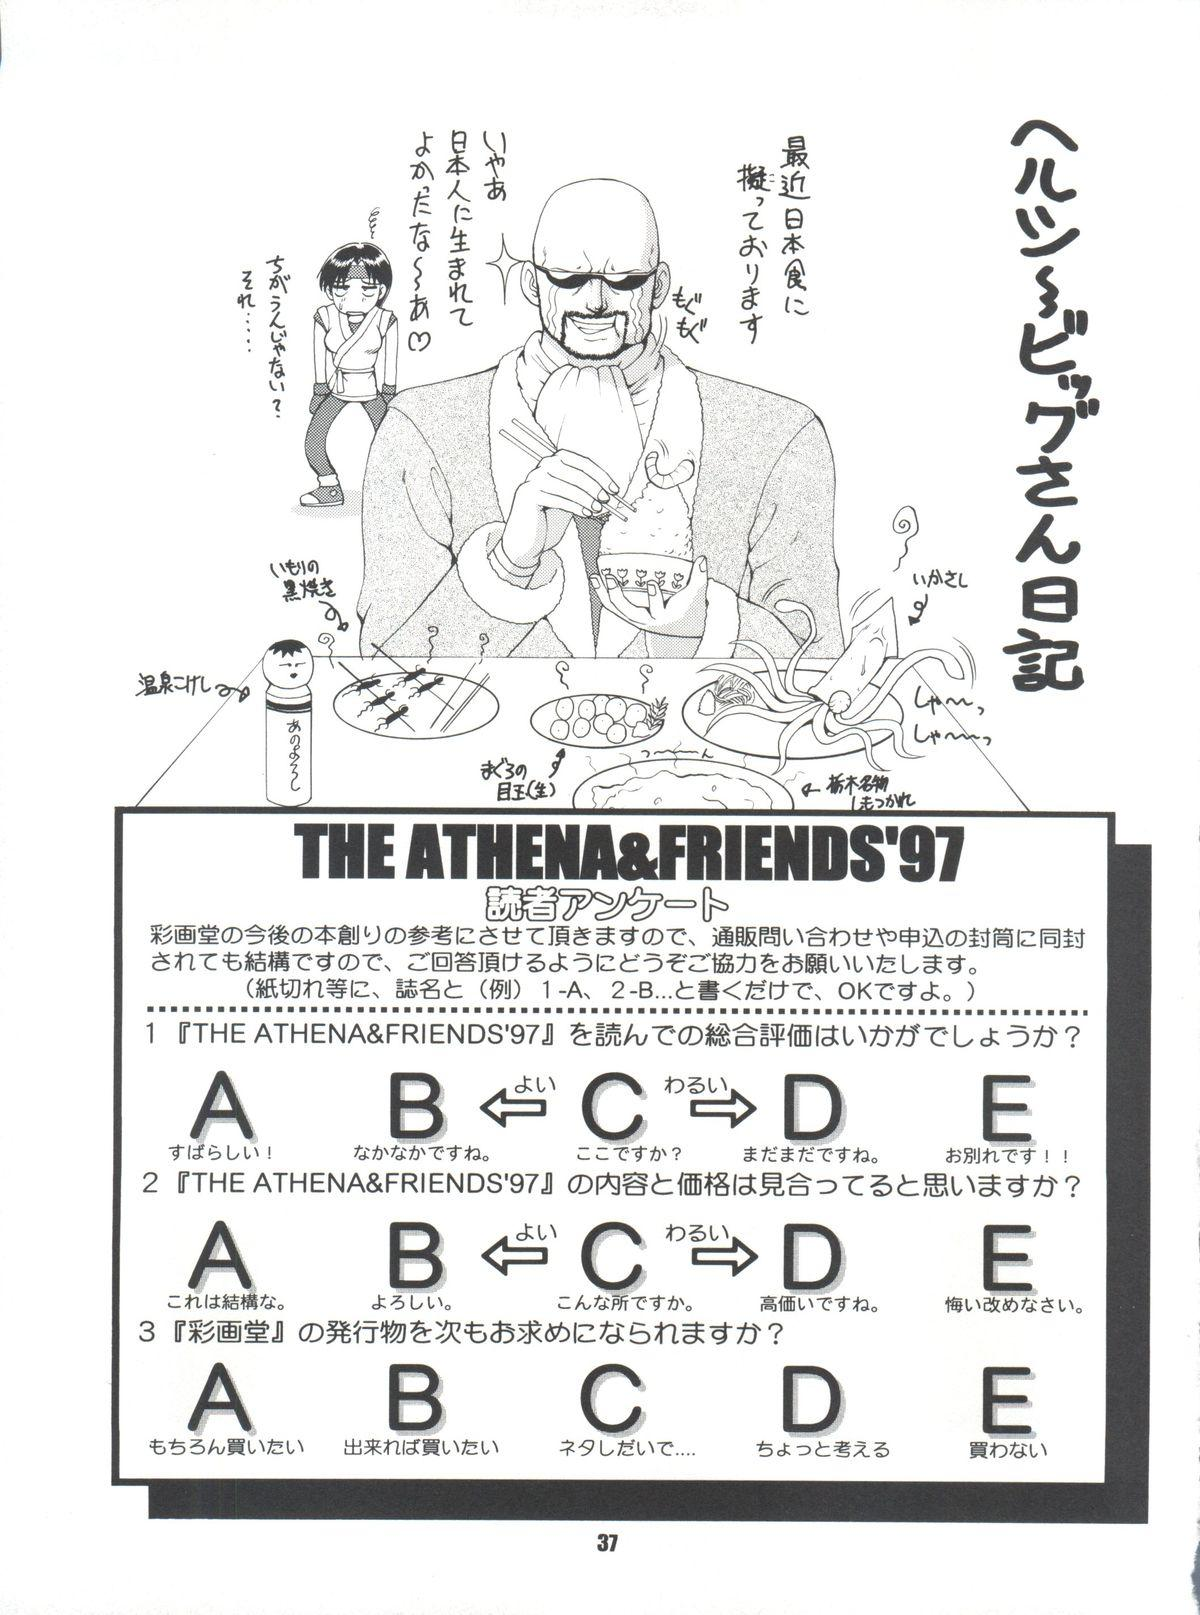 The Athena & Friends '97 35